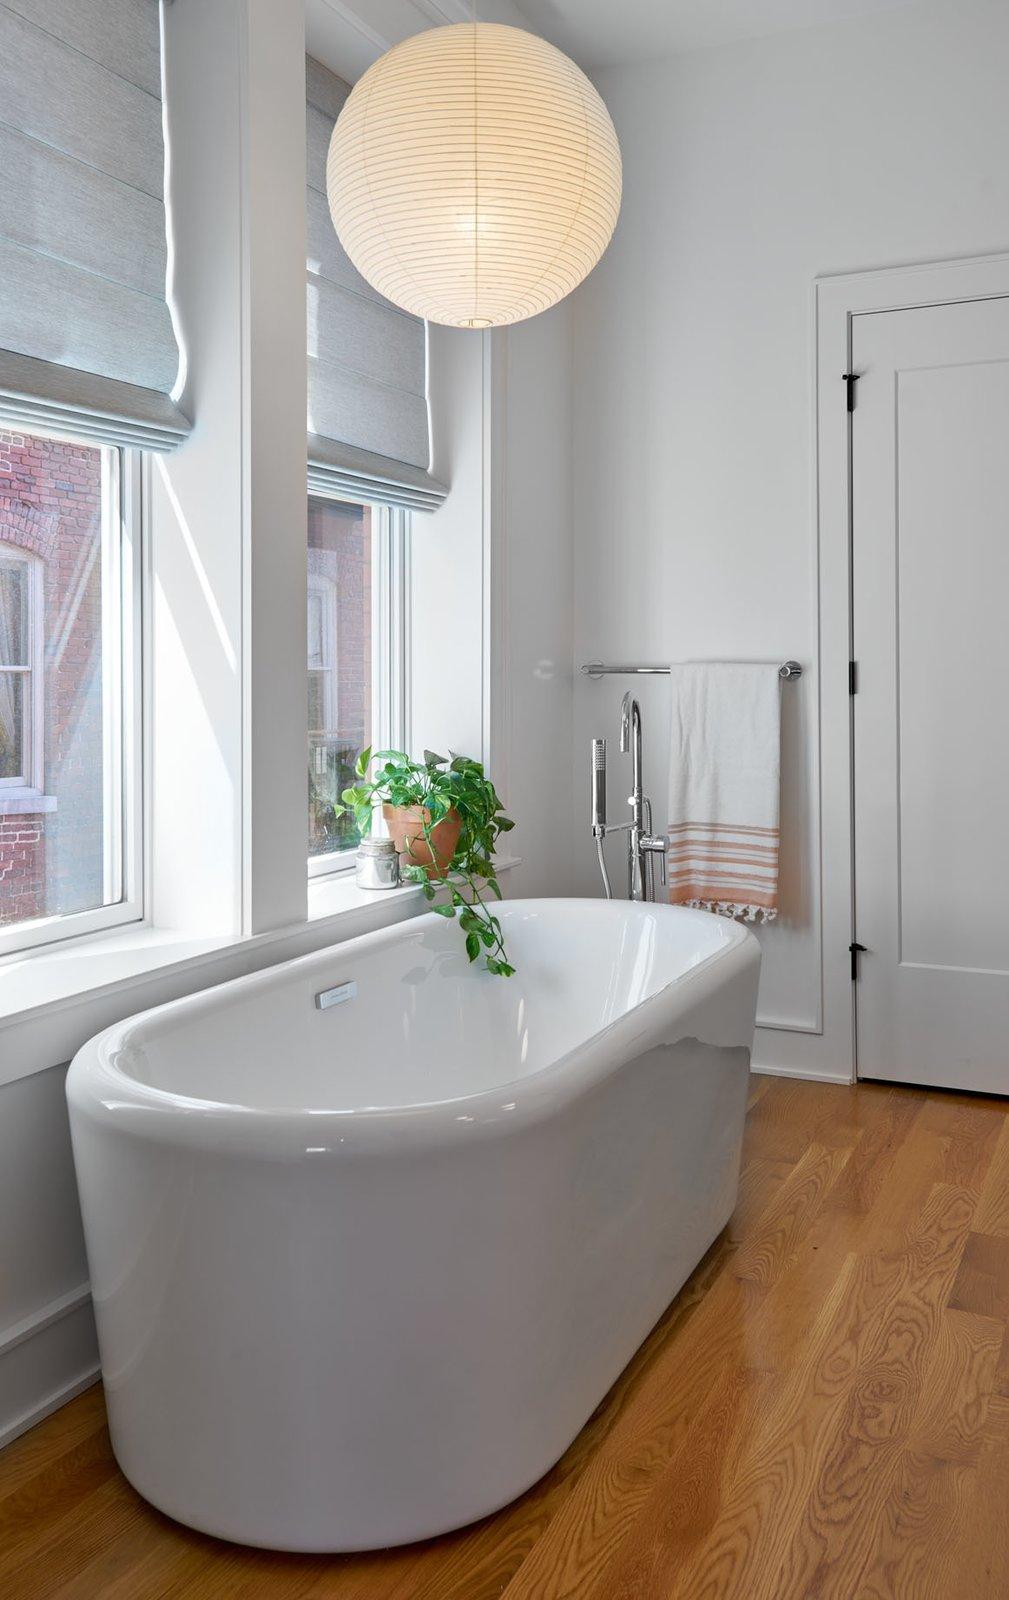 Bath Room, Freestanding Tub, and Pendant Lighting Master Bathroom  The Historic Ely Building